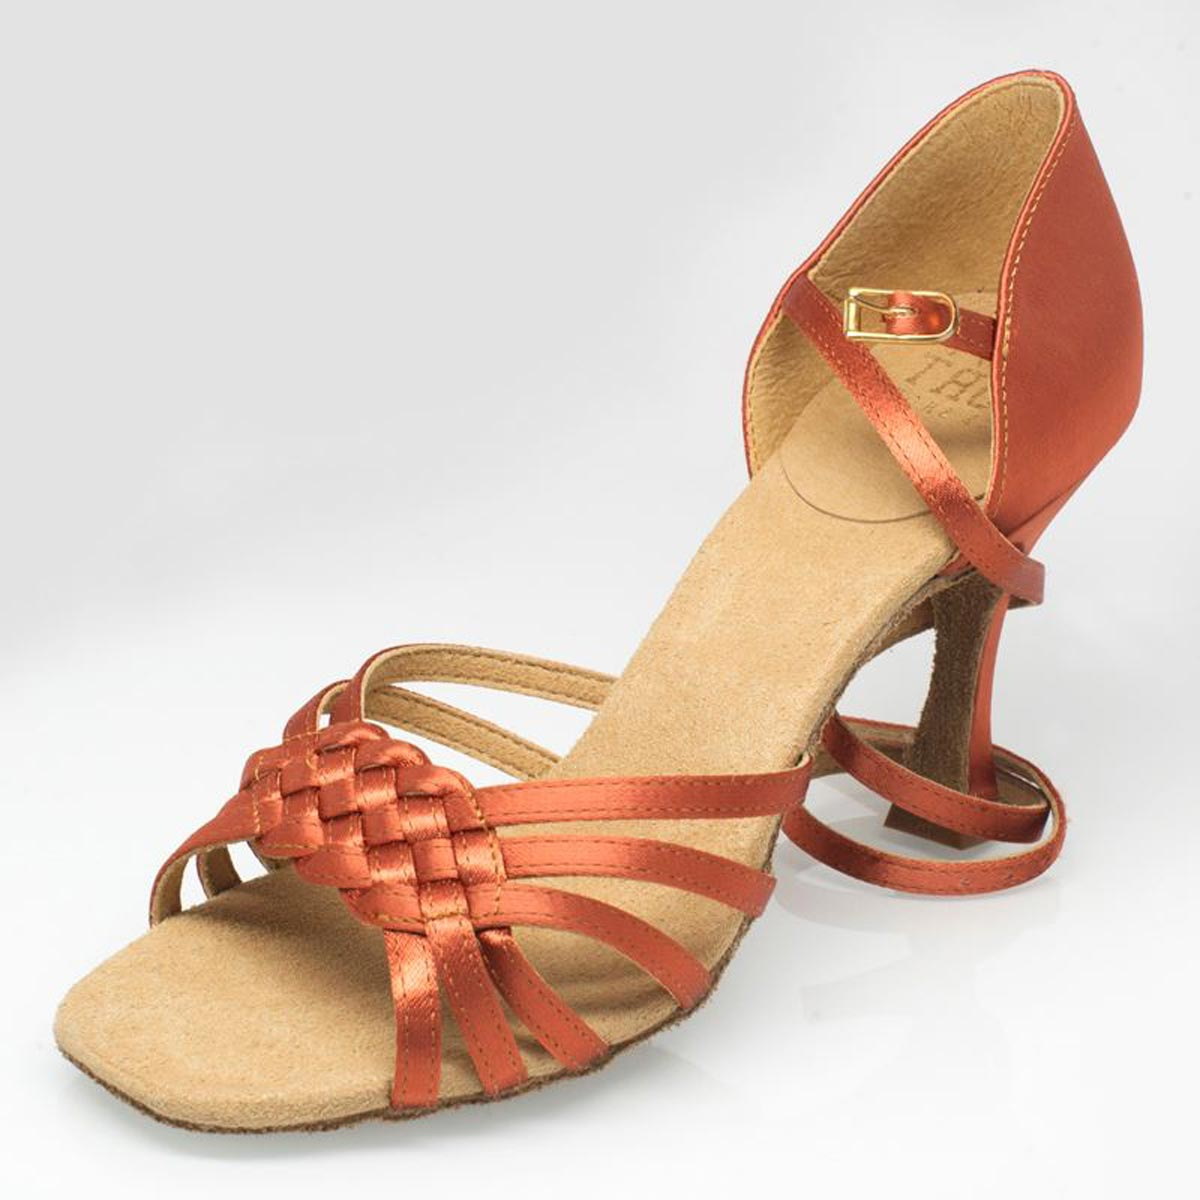 8006eab8b86b Ray Rose - Ladies Dance Shoes 869 Moonglow - Dark Tan